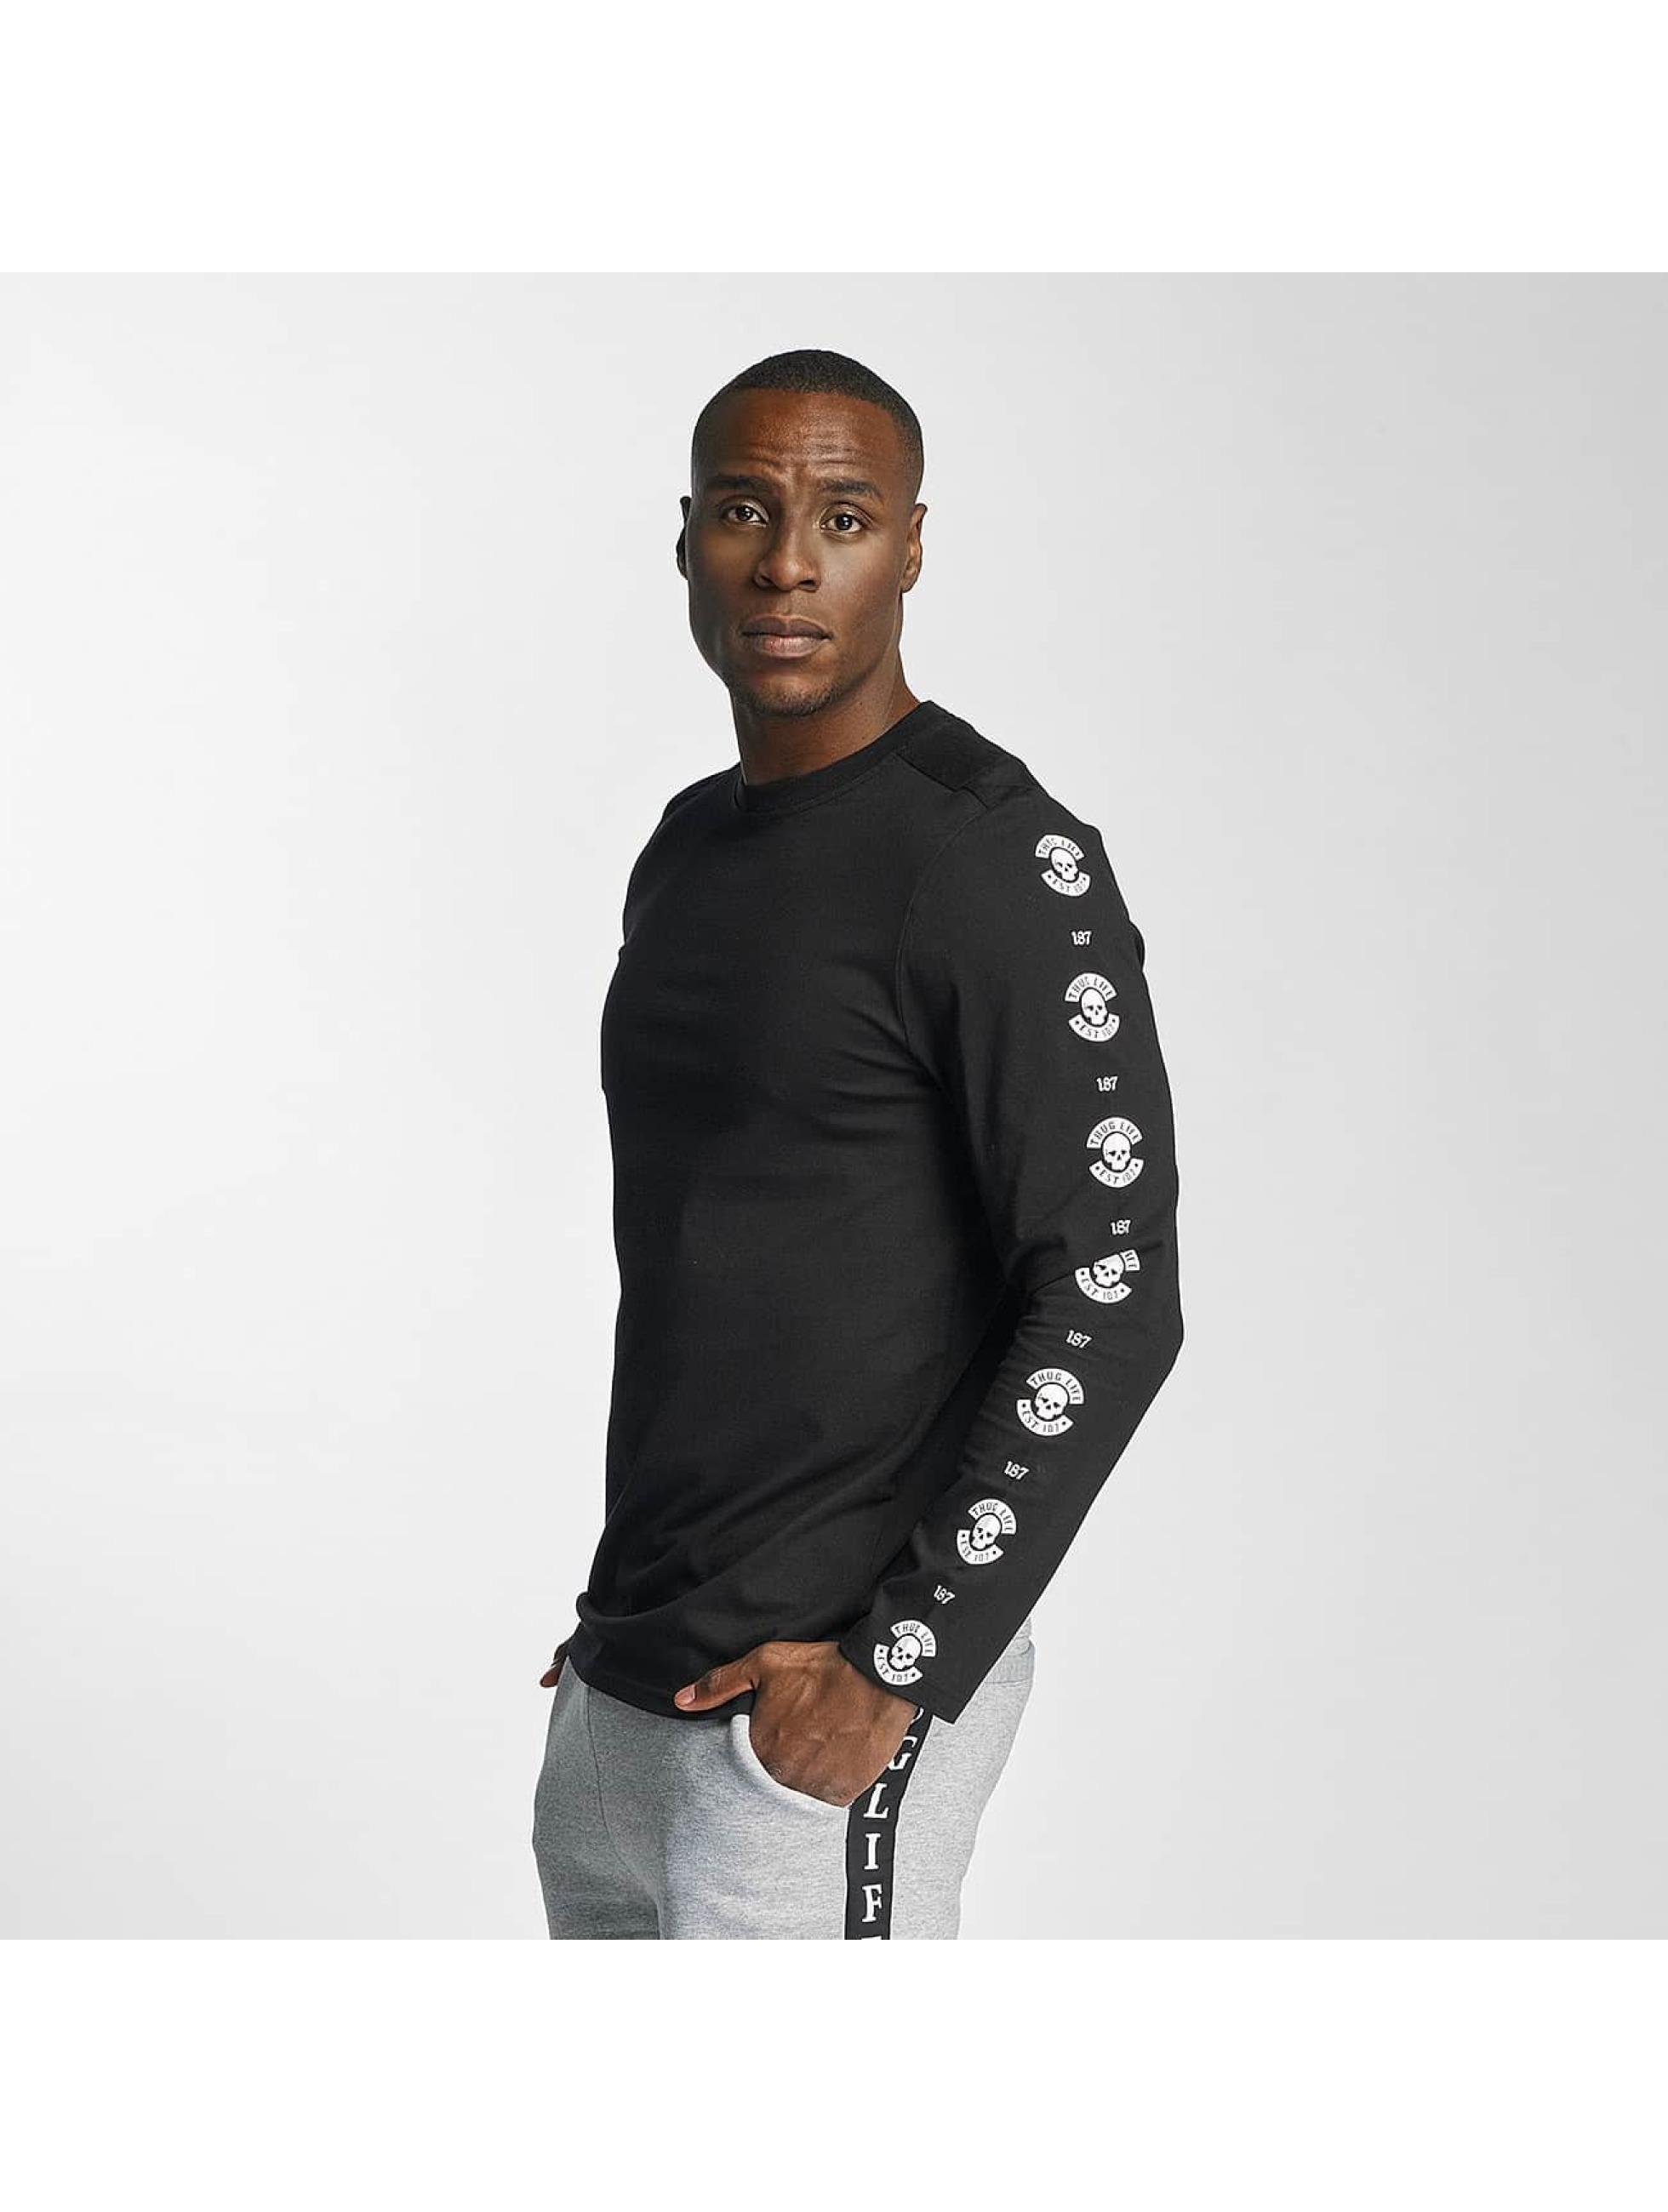 Thug Life / Longsleeve Carlos in black L